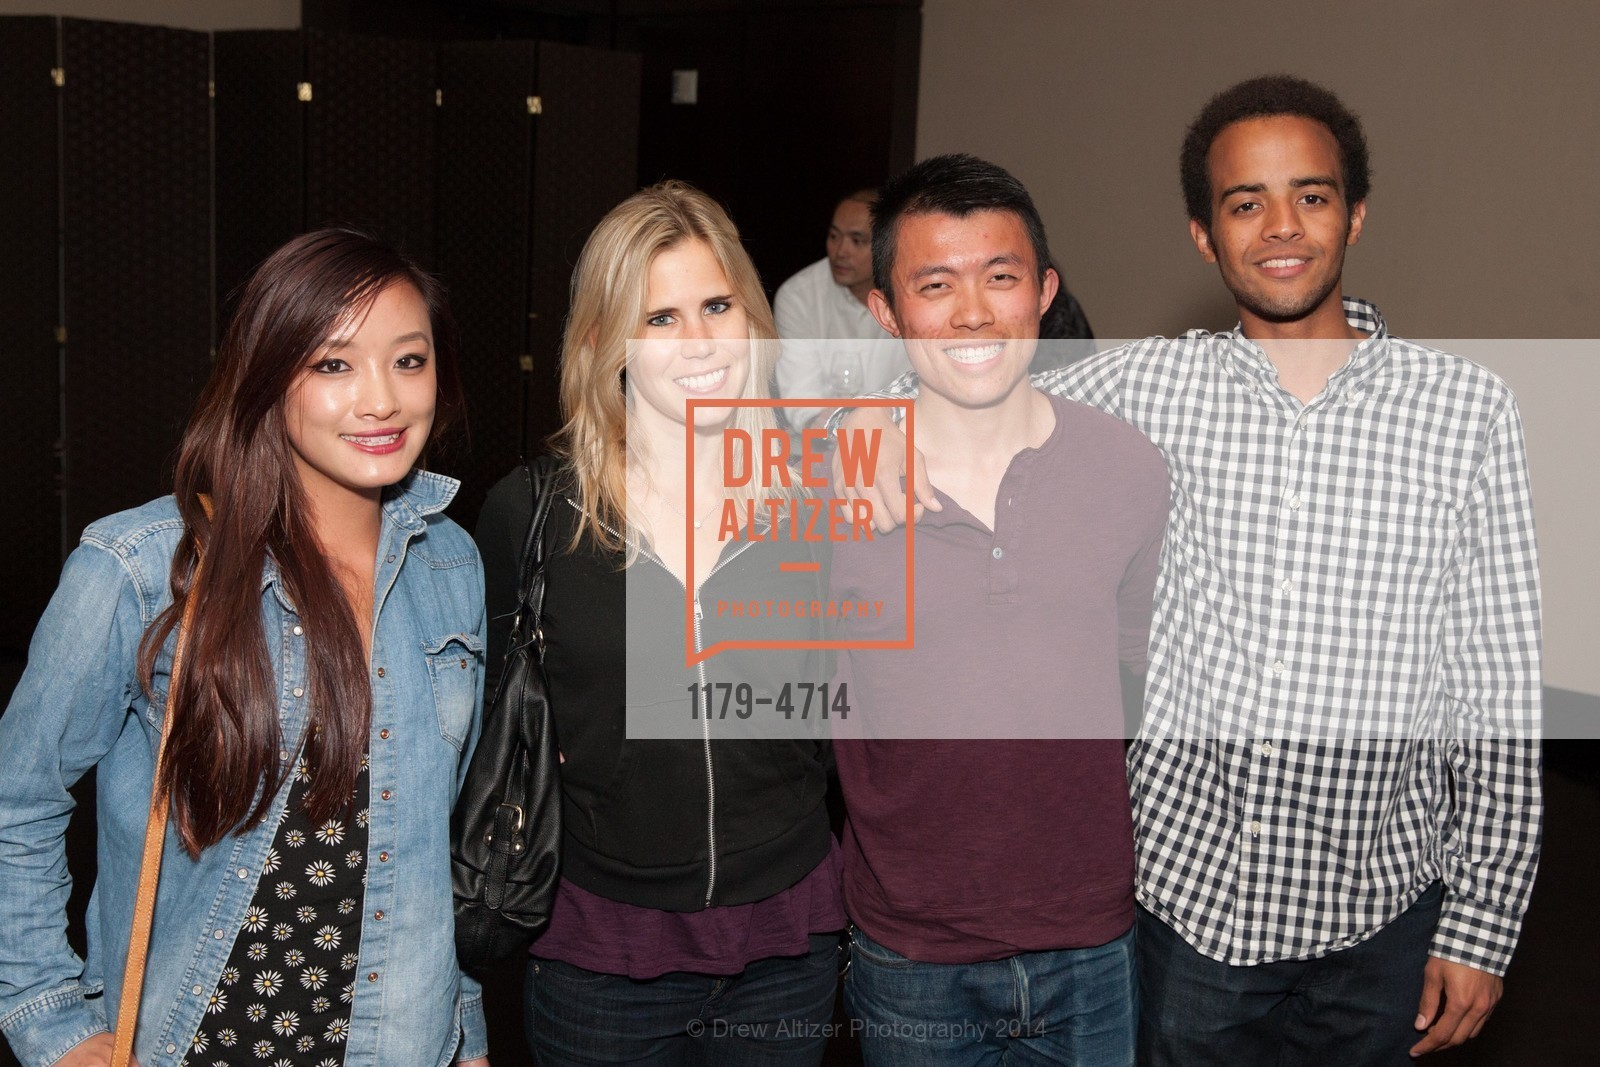 Kathy Kwan, Cory Walter, John Si, Matthew Gebre, Photo #1179-4714